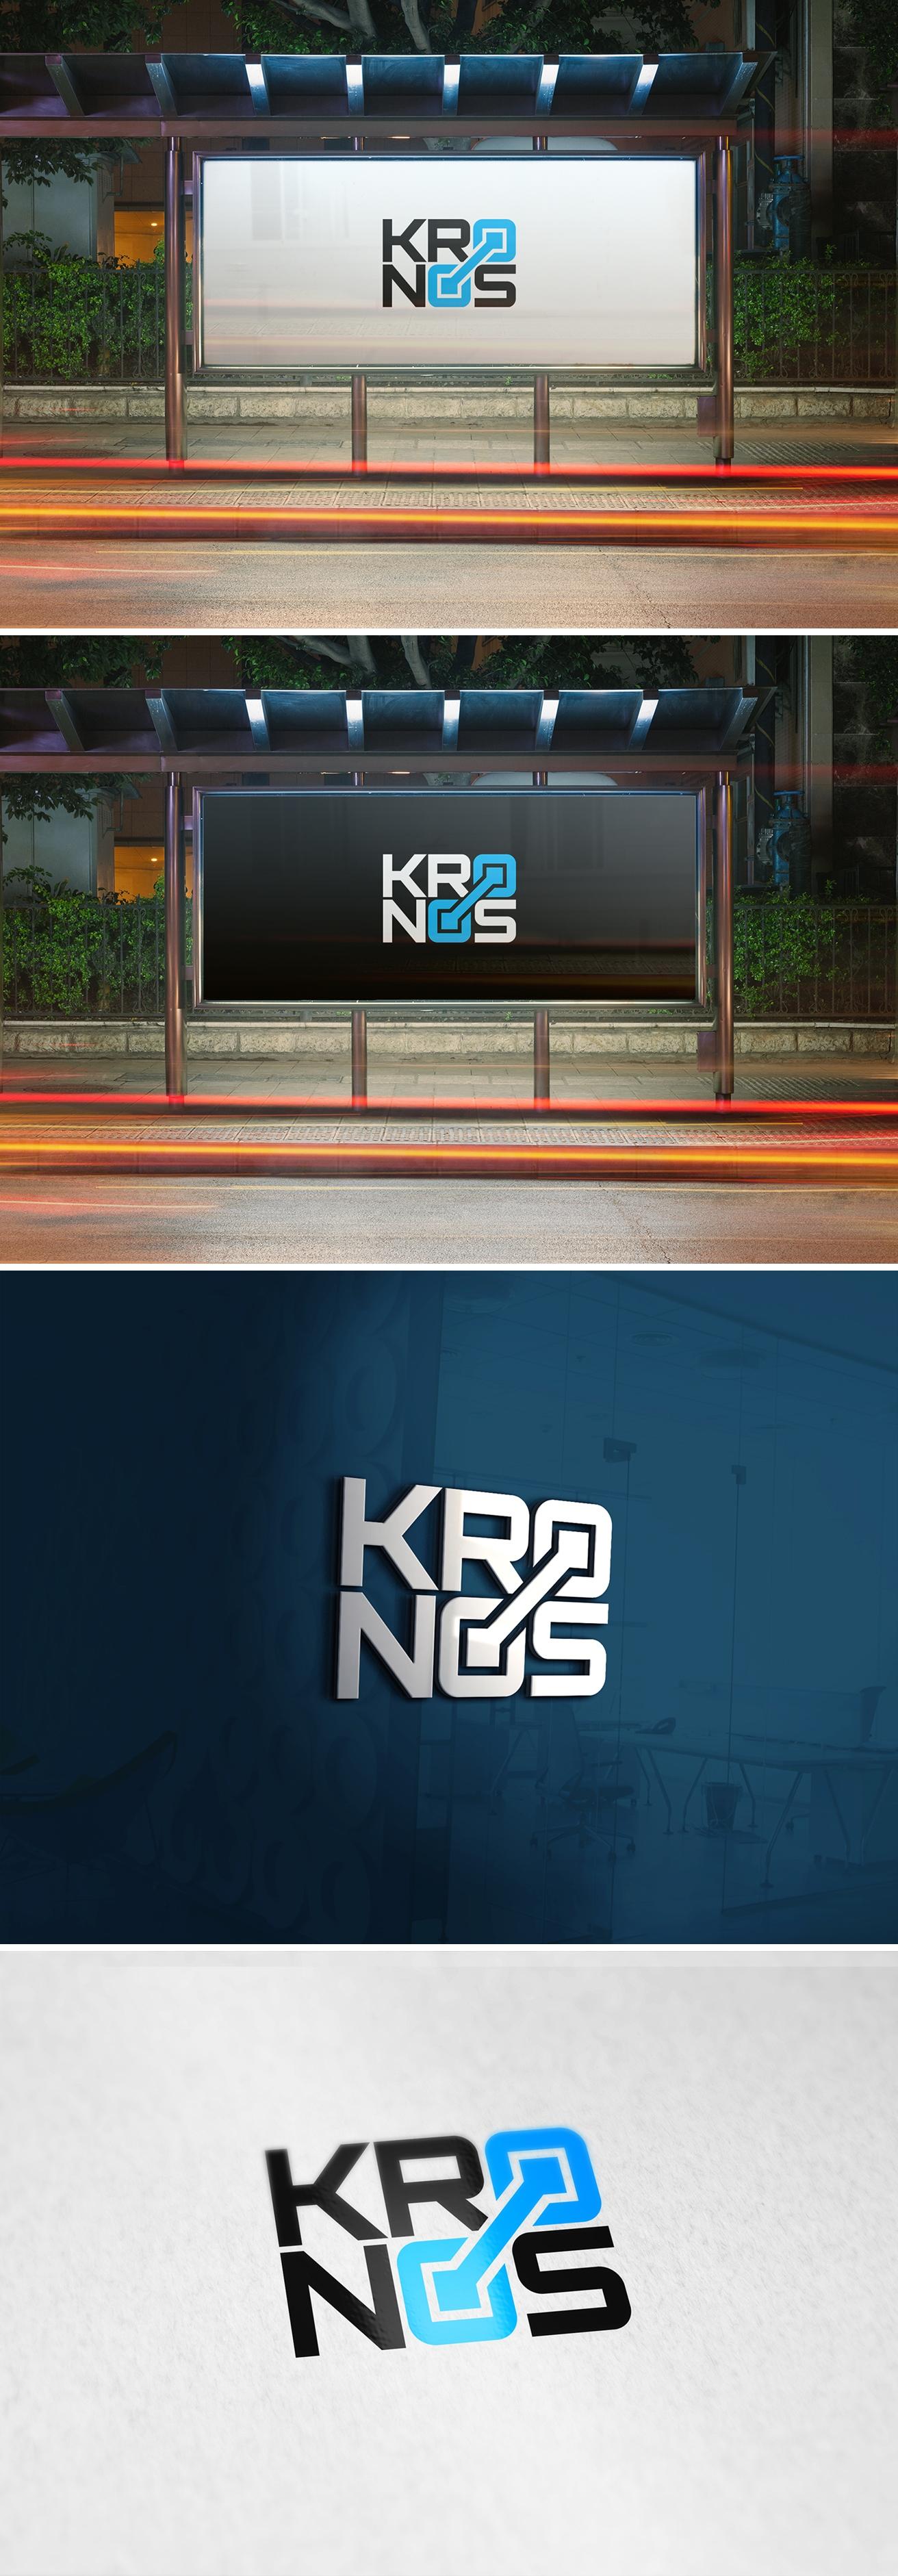 Разработать логотип KRONOS фото f_7025faf9853e0ca2.jpg